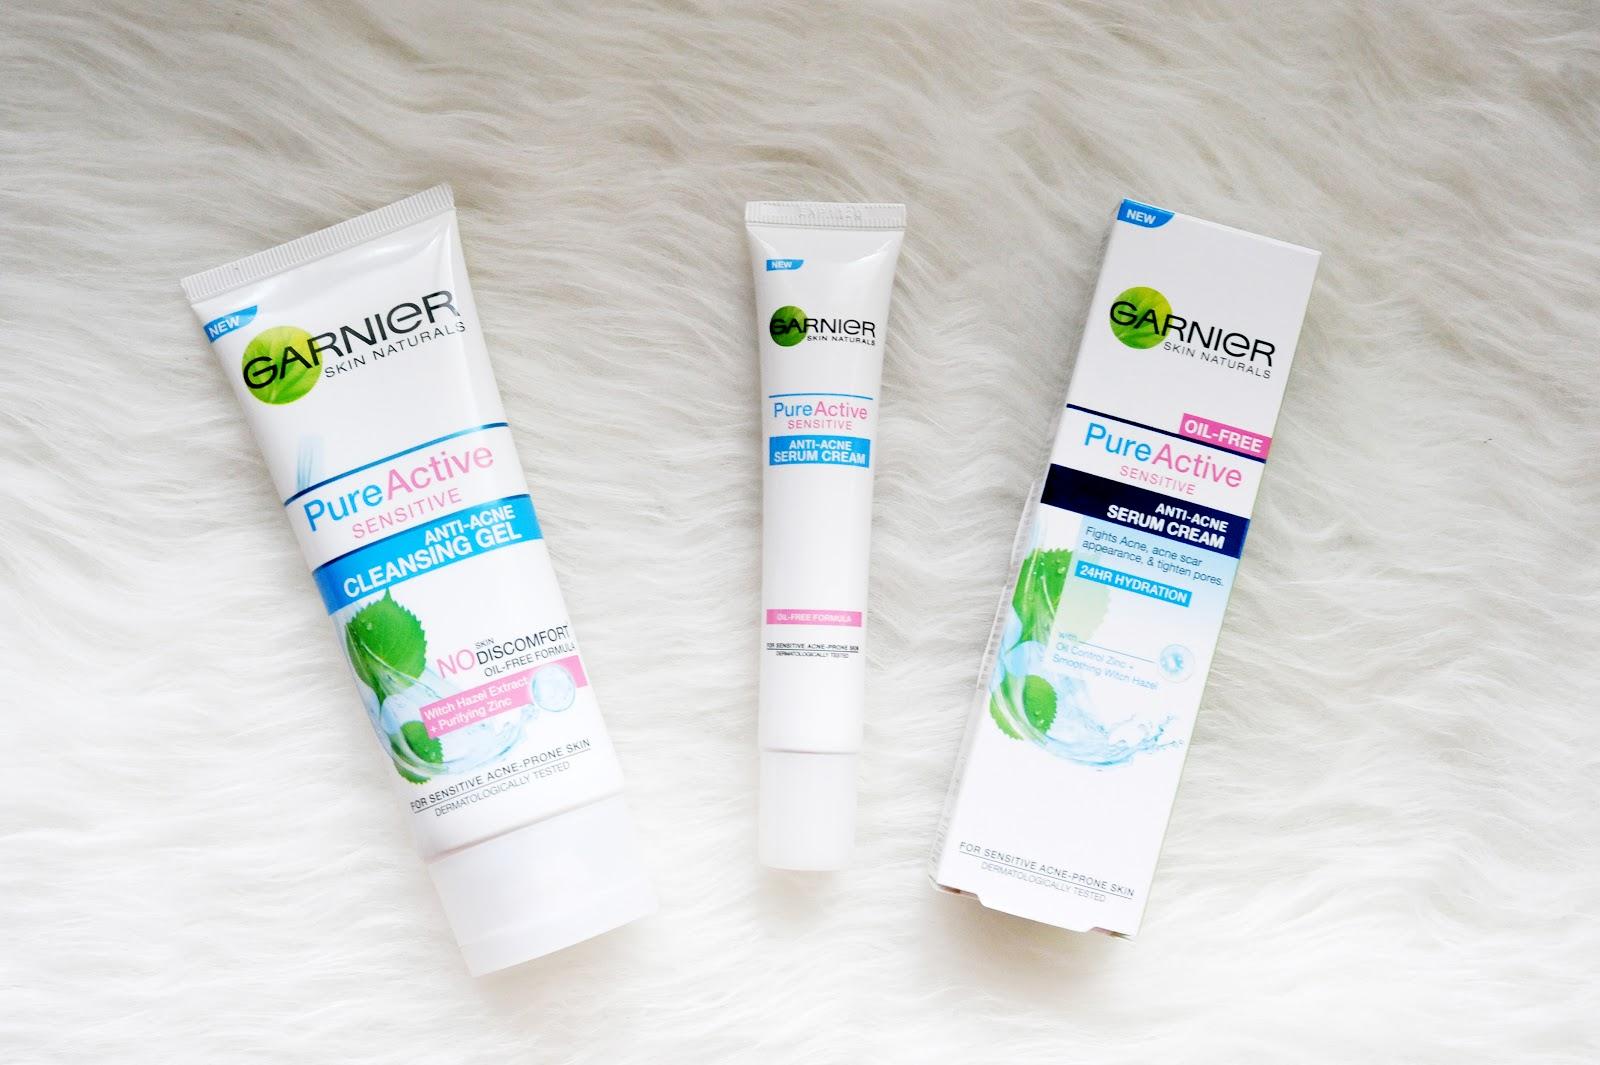 Review Garnier Pure Active Sensitive Anti Acne Magellanictivity Care Whitening Cream 20ml Di Sini Gue Bakal Dua Produknya Yaitu Cleansing Gel Dan Serum Iya